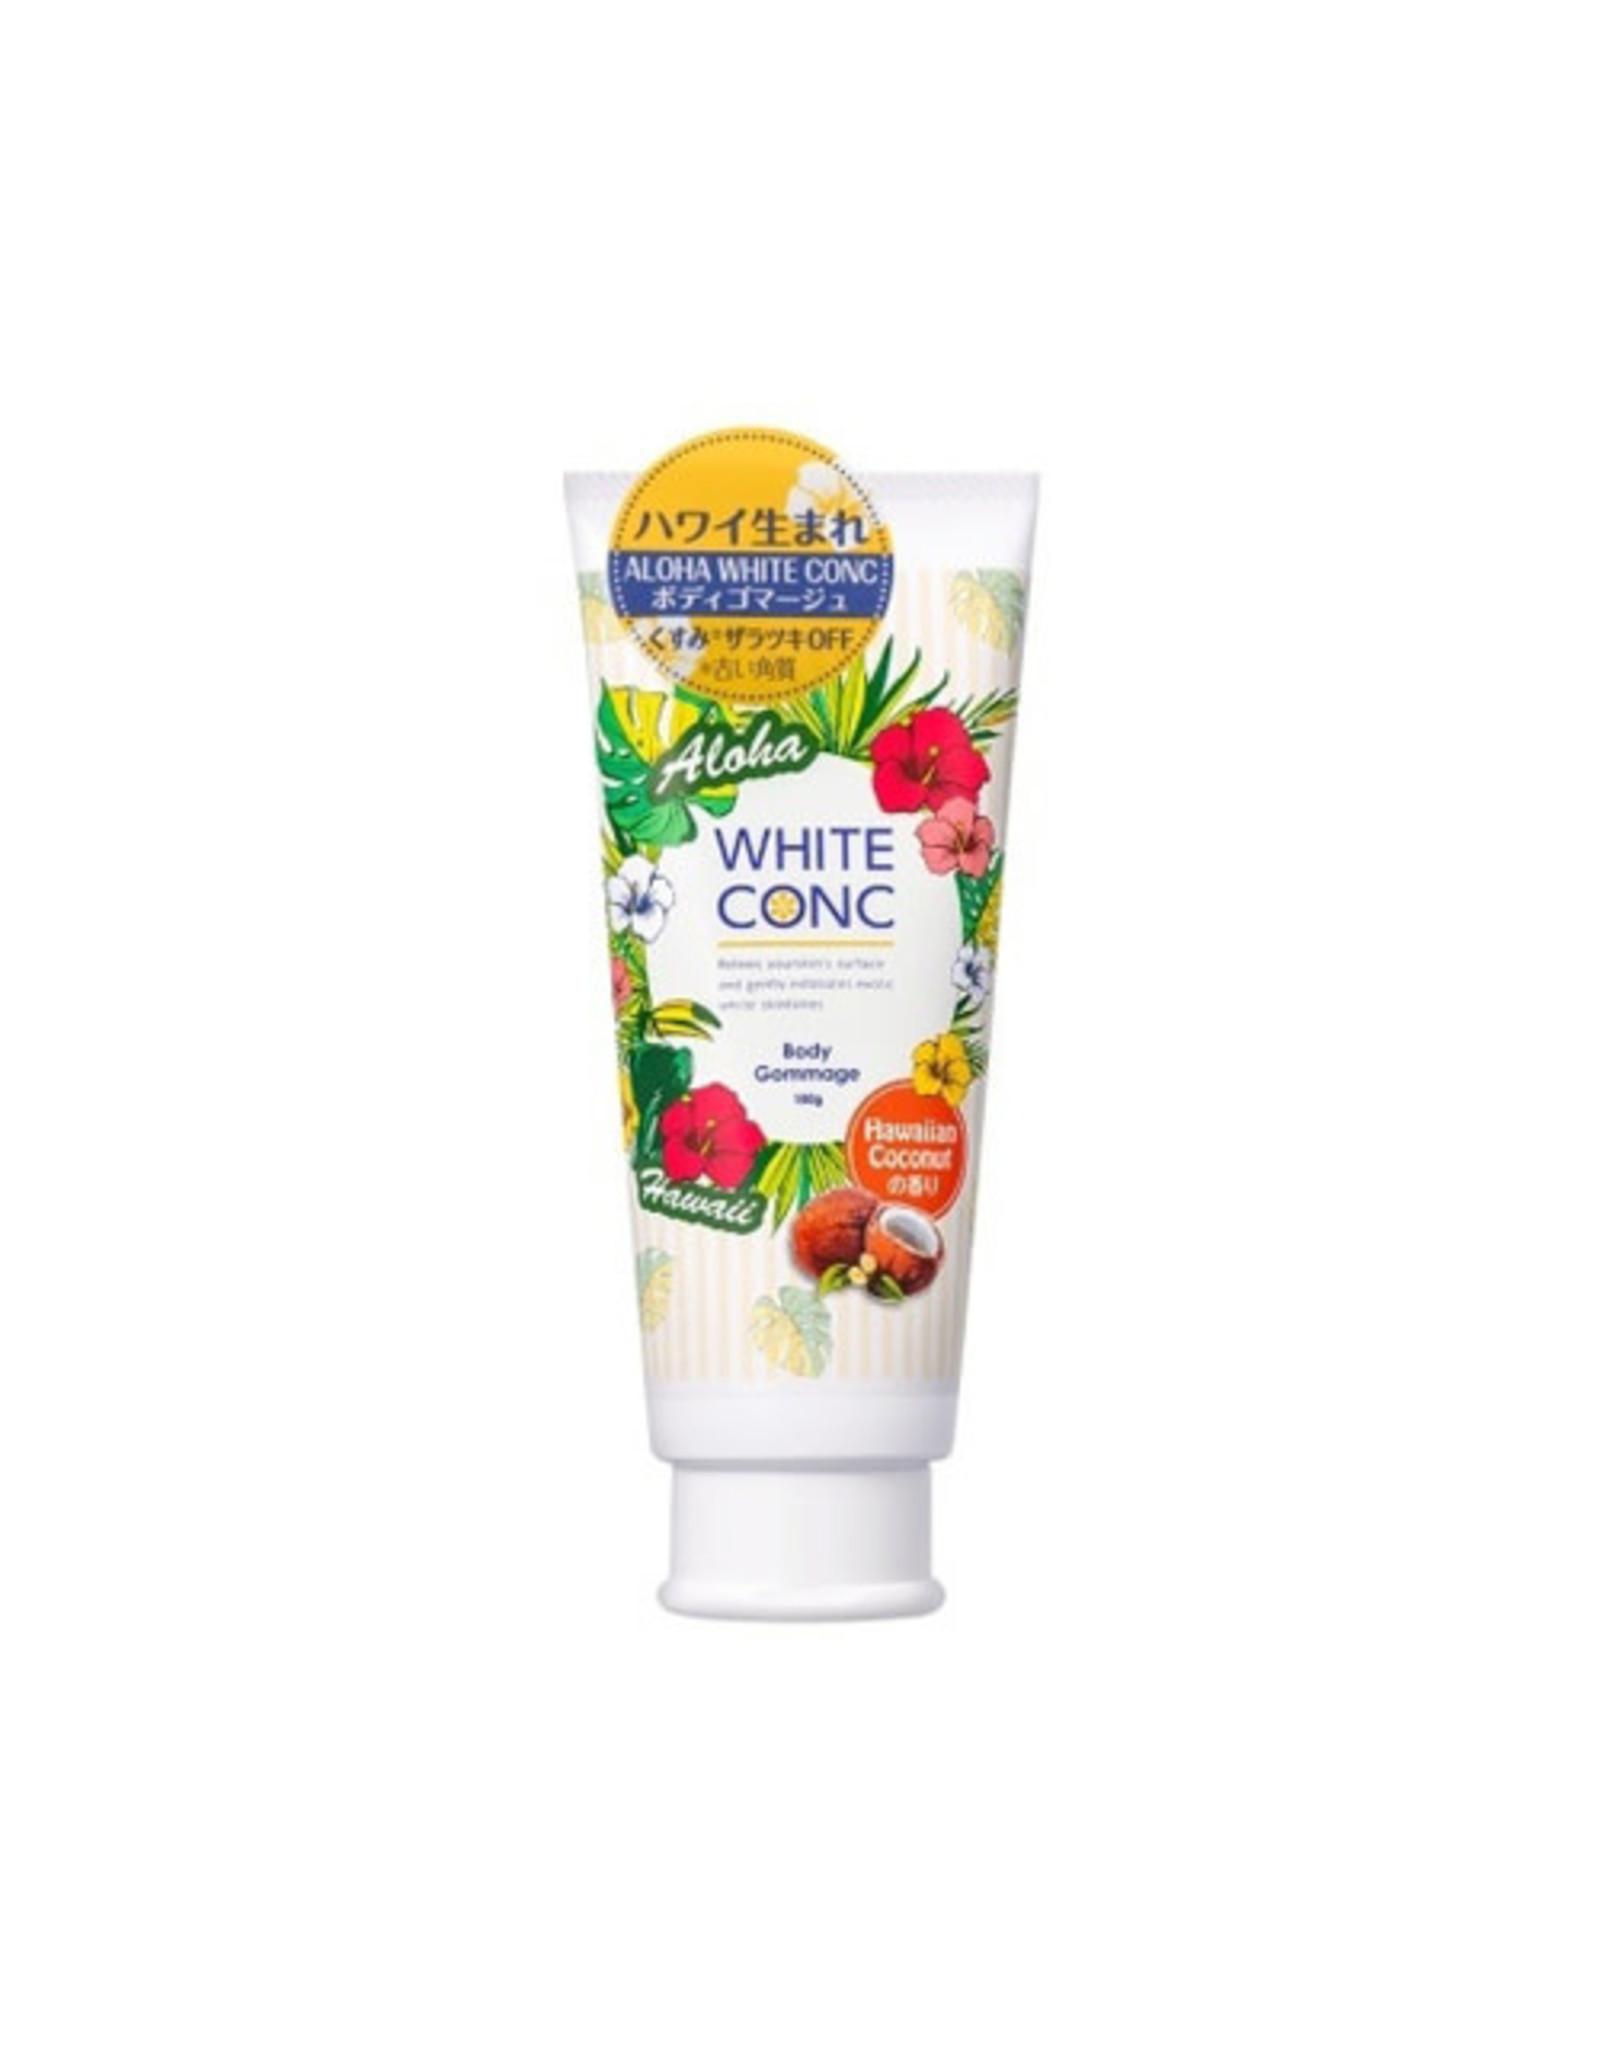 White Conc White Conc Body Scrub CII Hawaii Coconut - Limited